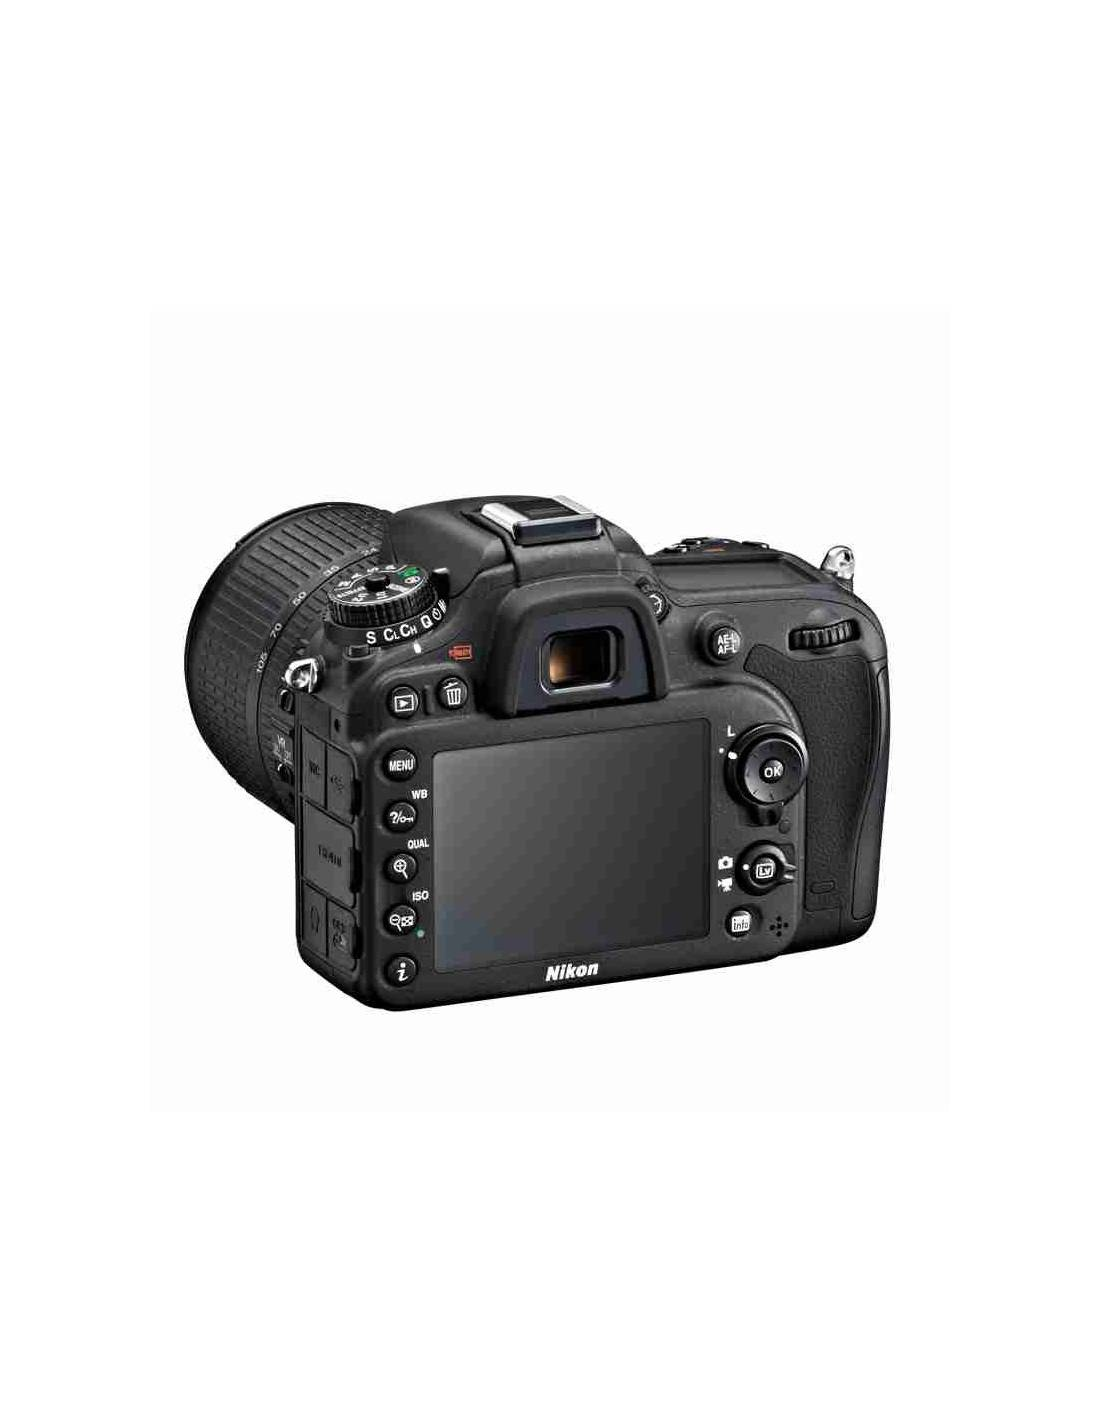 NIKON D7100 + 18-105 VR - FOTO K